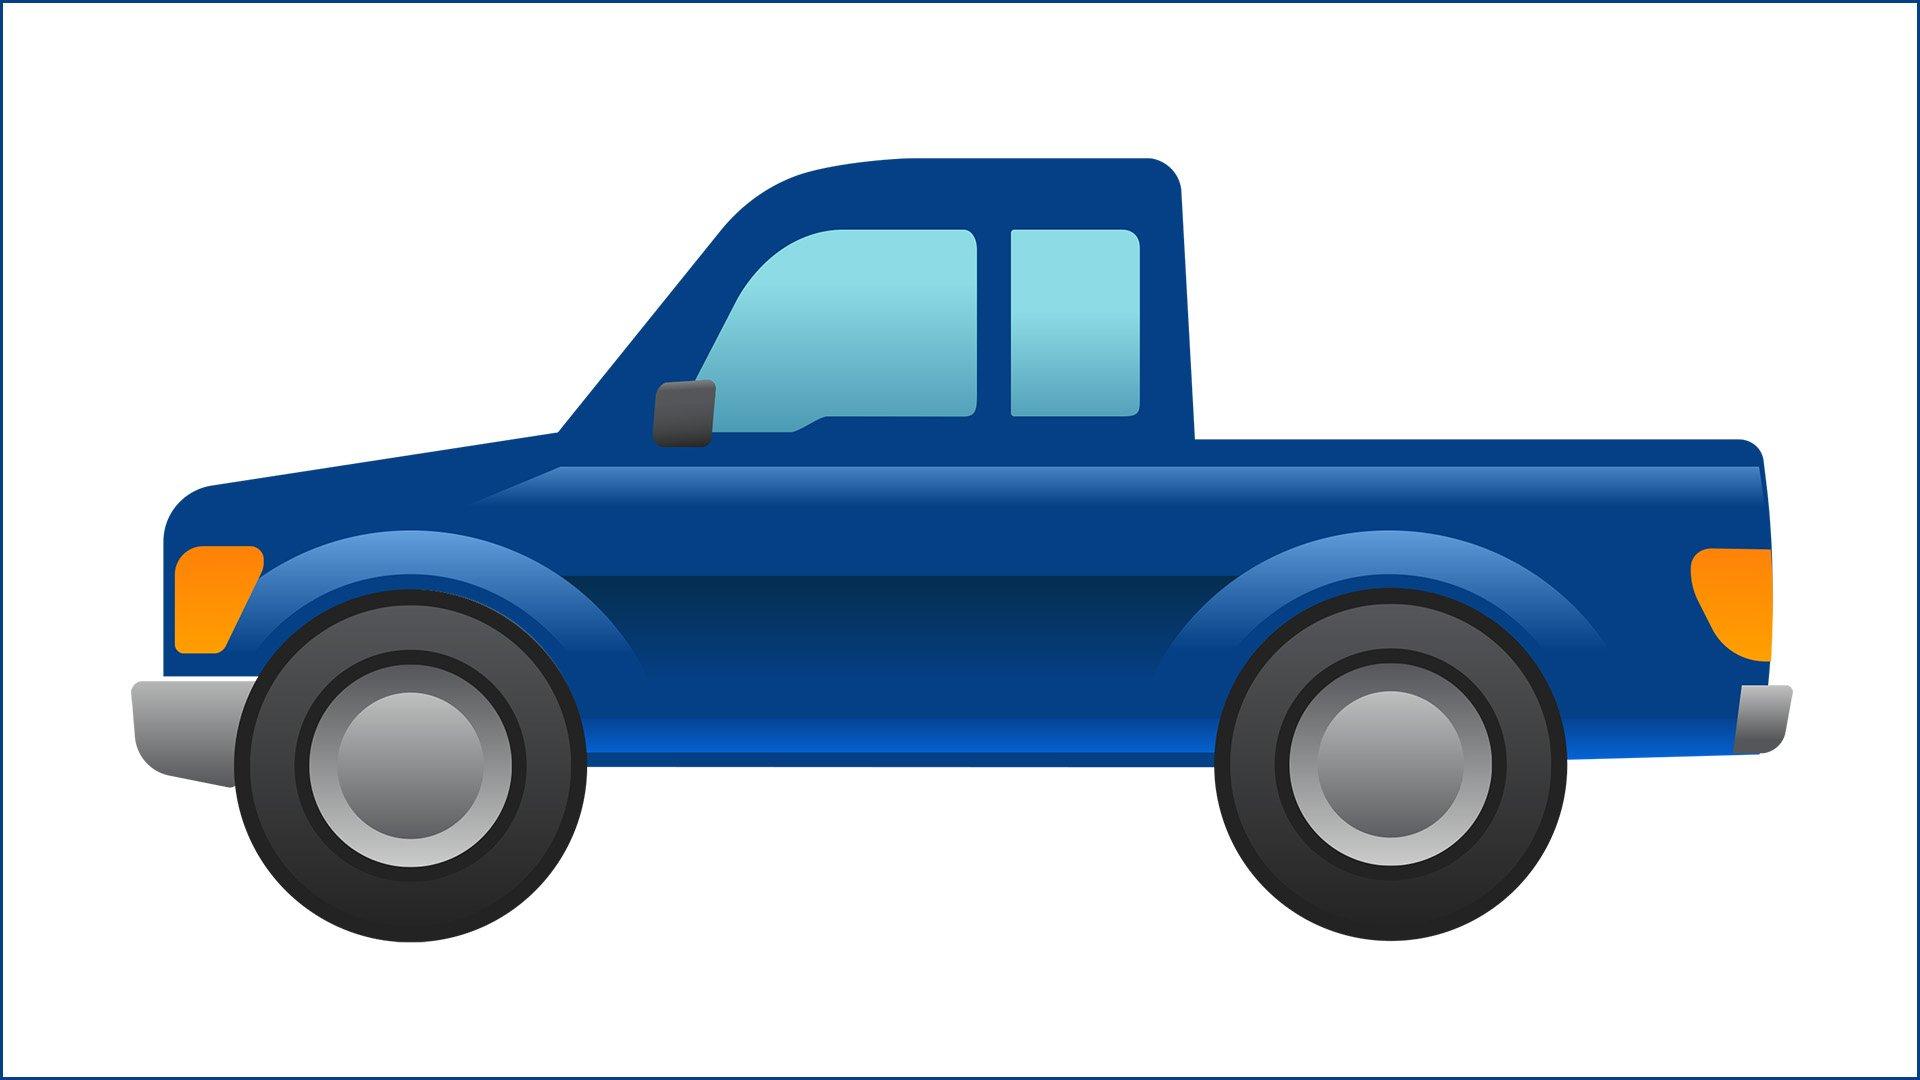 Ford Motor Company Releases New Truck Design - The Lasco Press